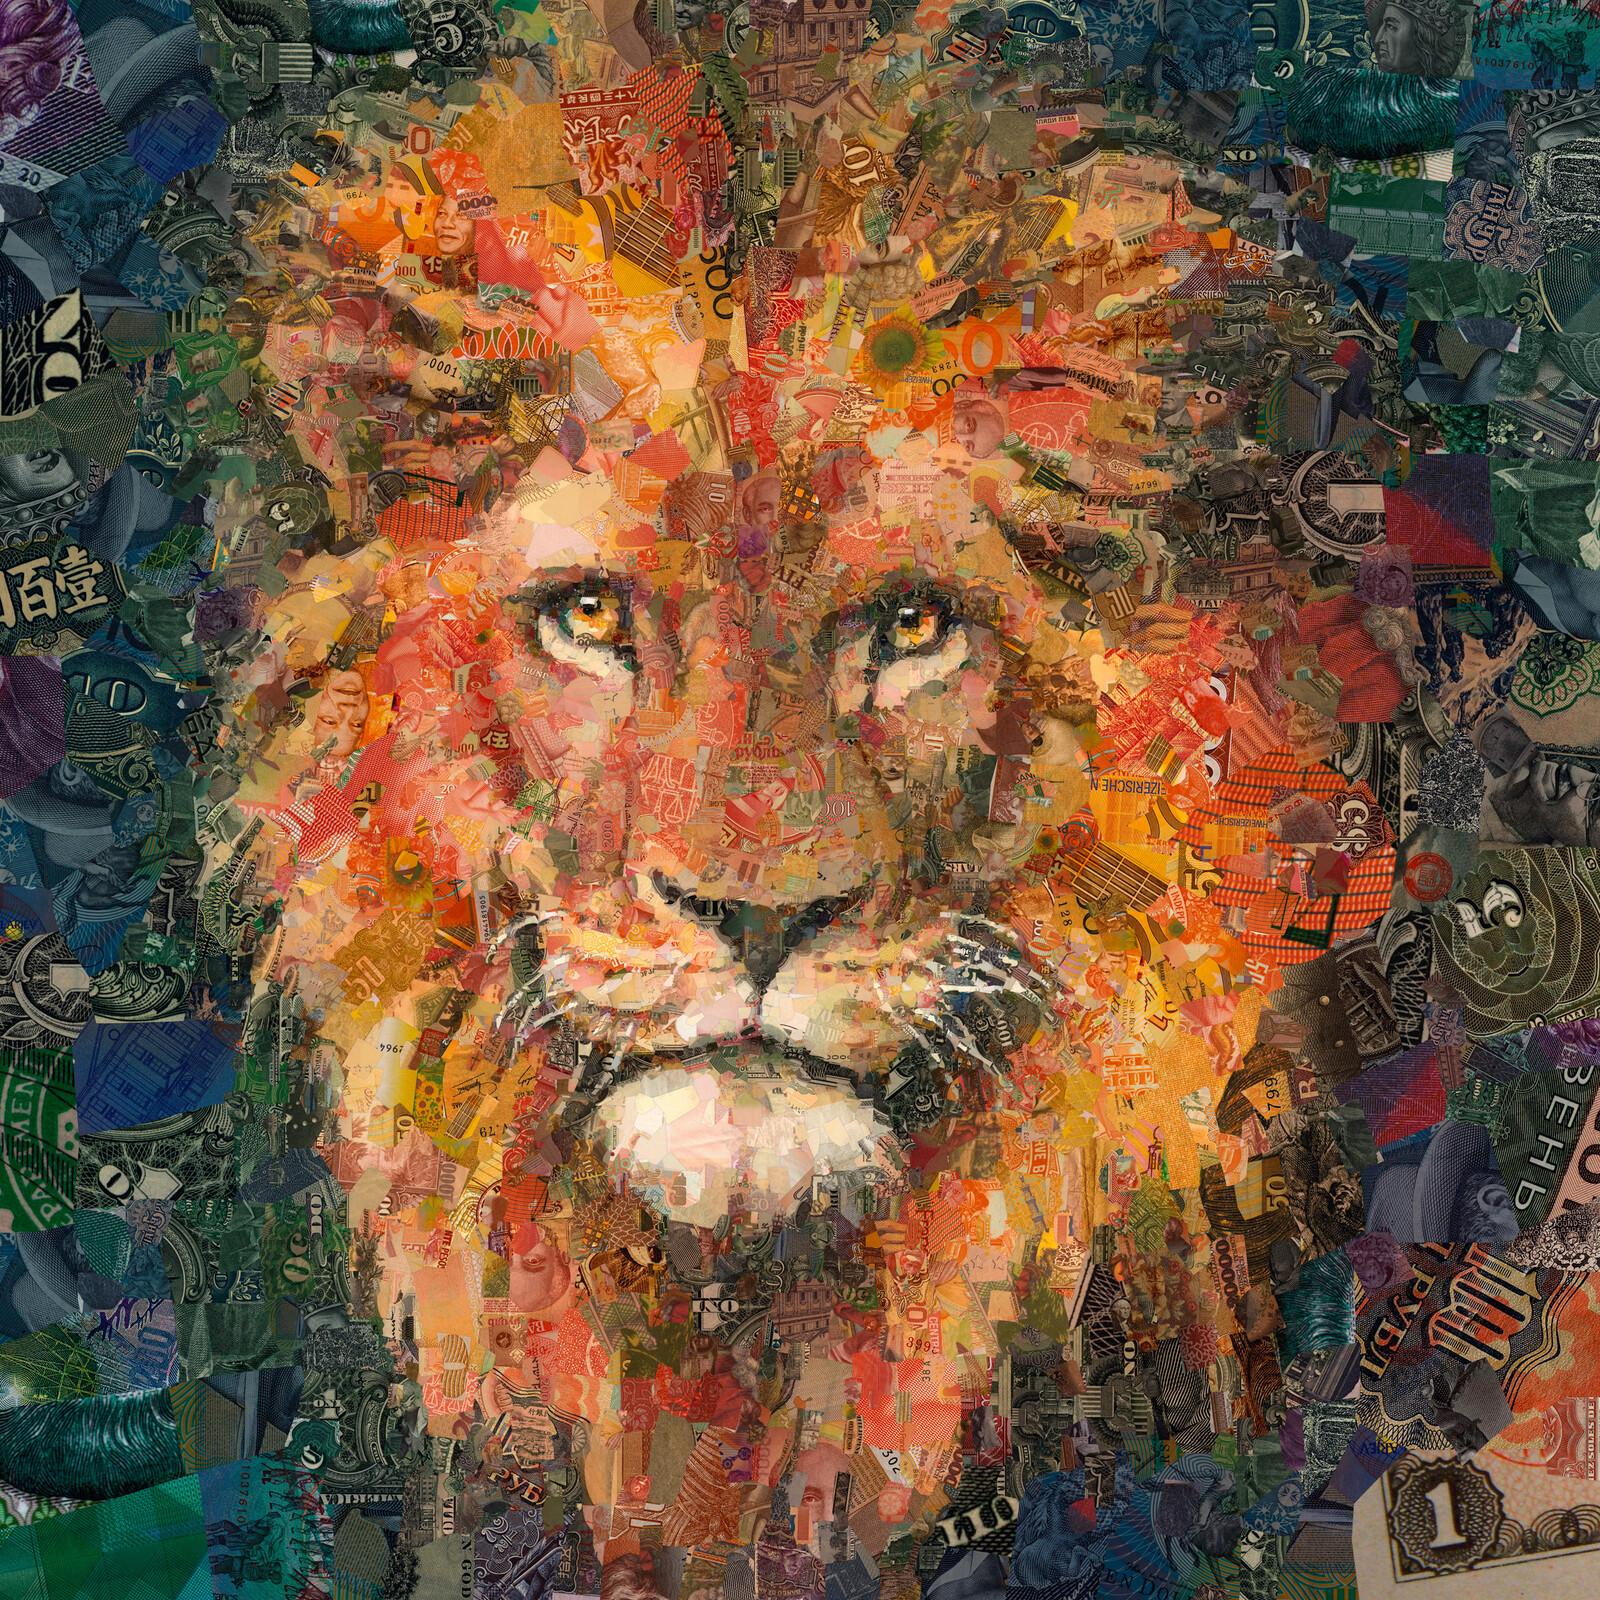 Lion - Charis Tsevis